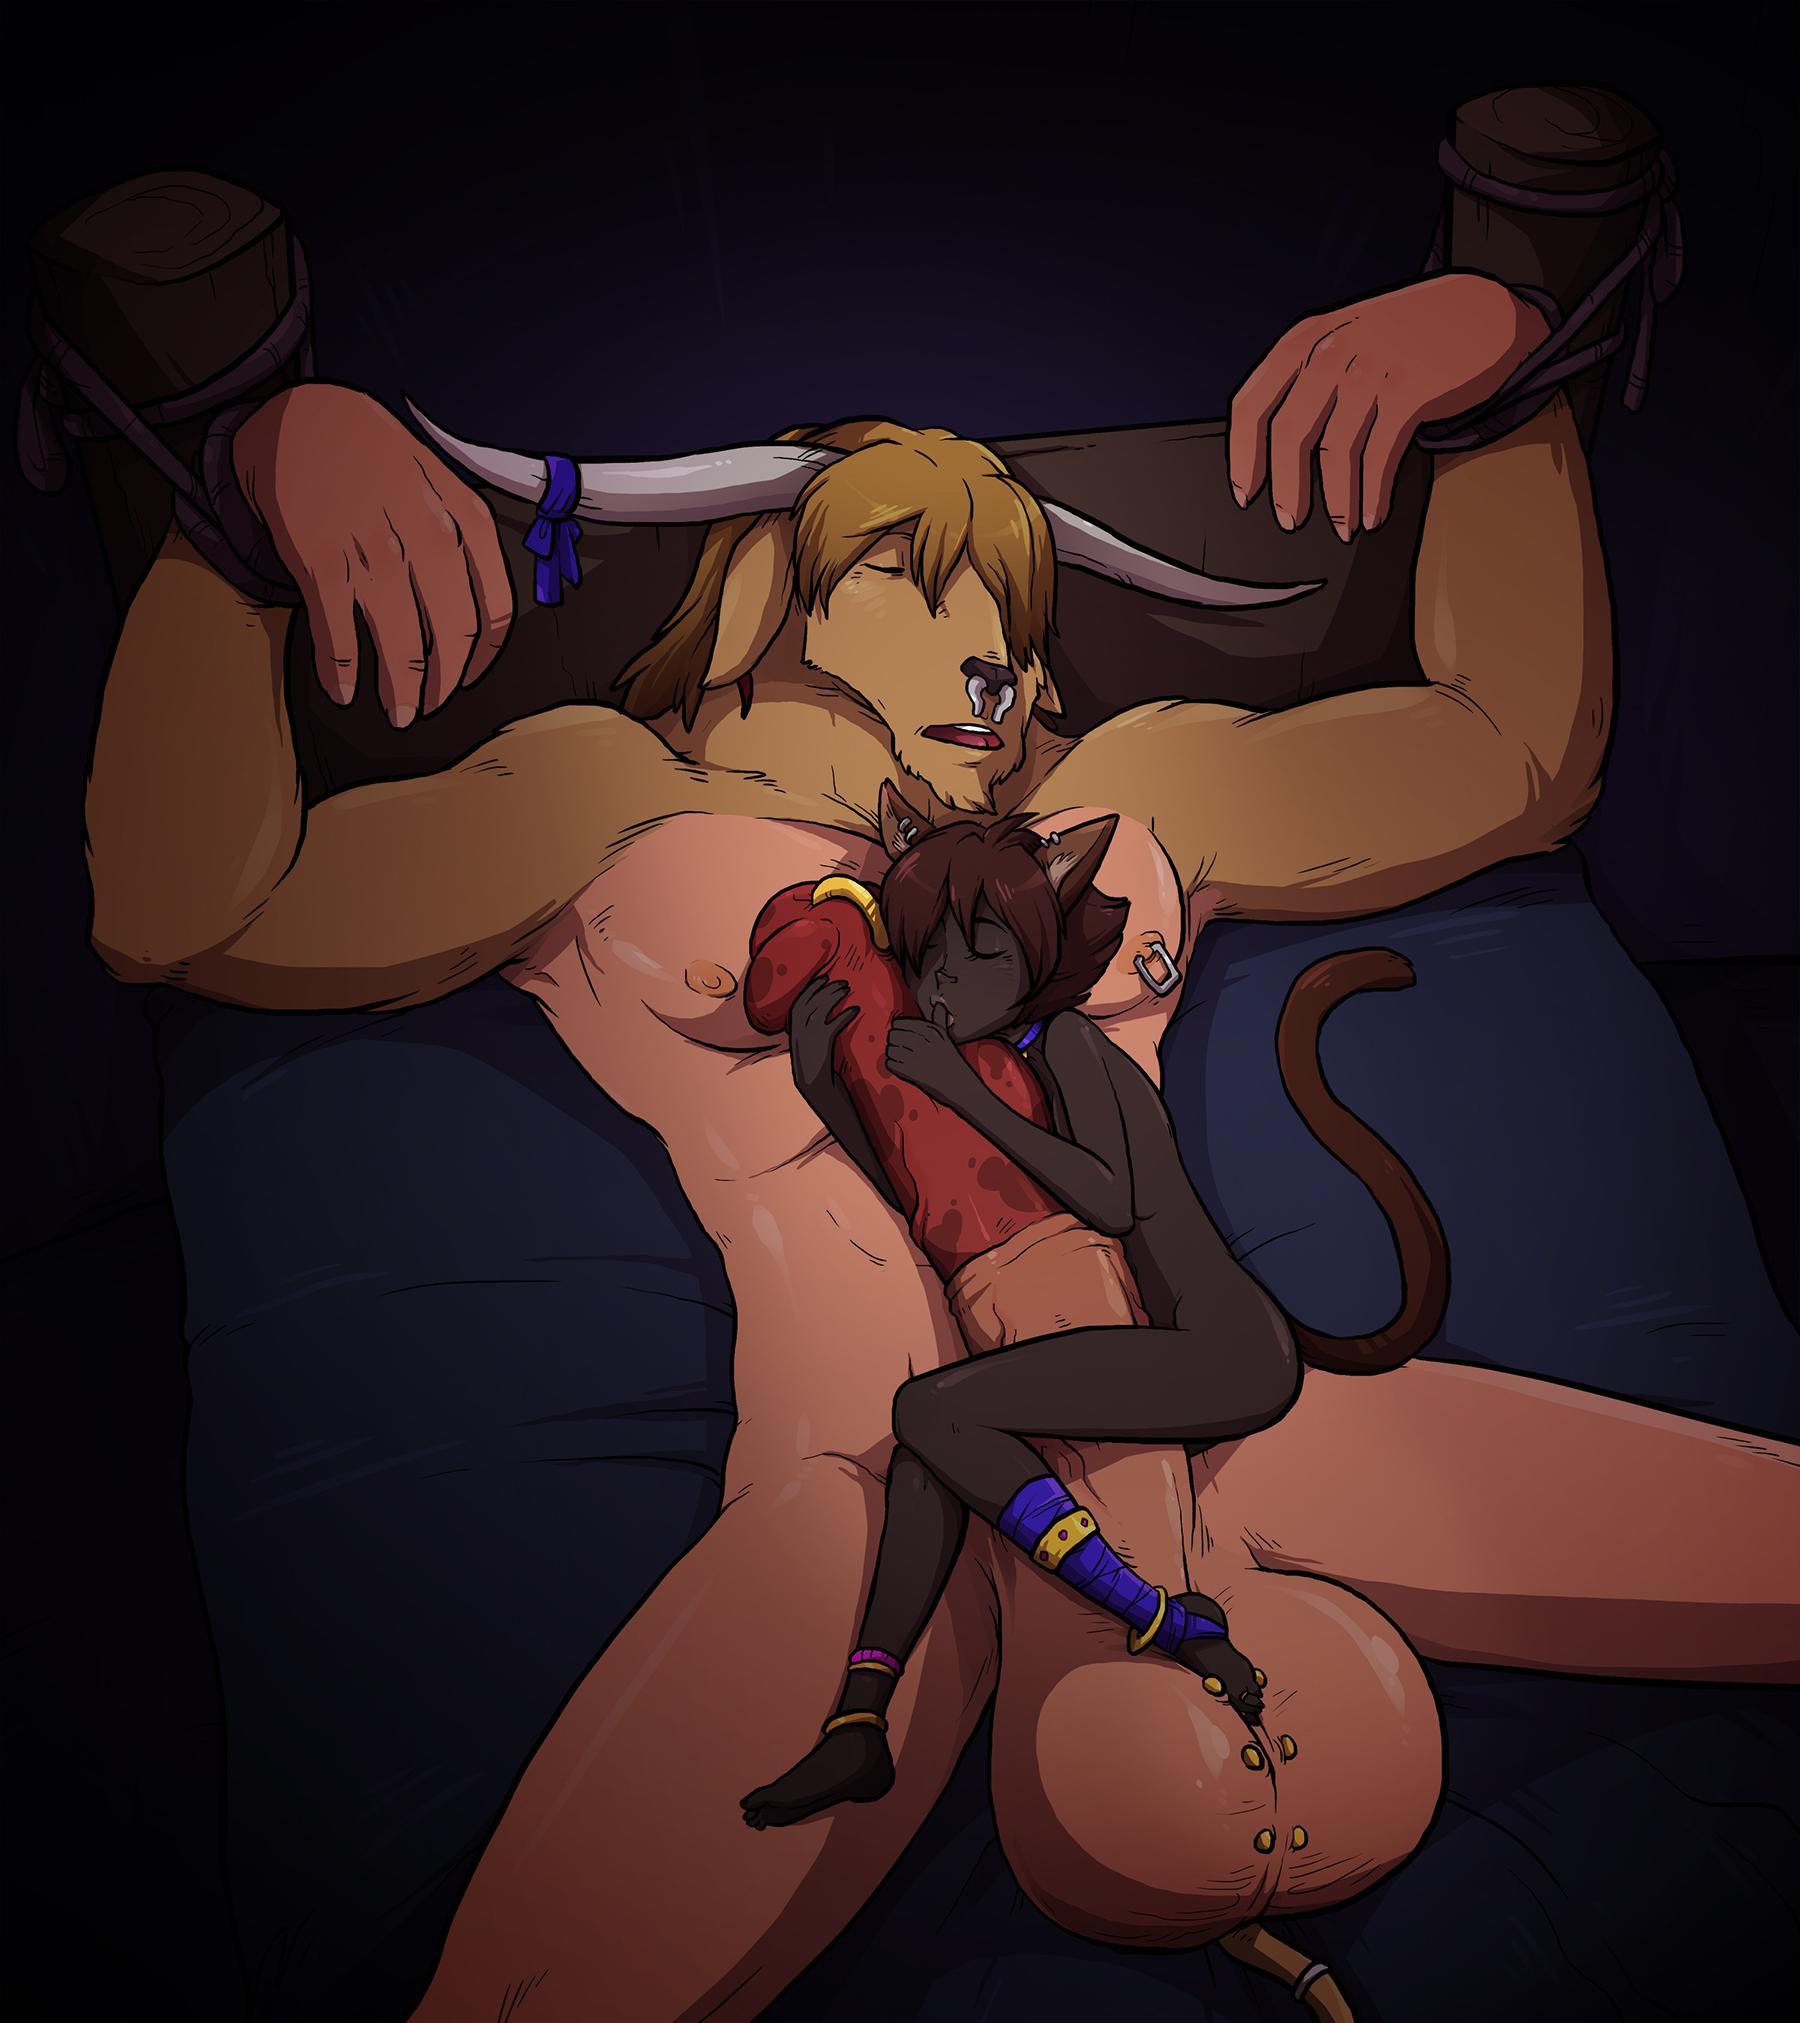 toys gay anime monster gay himself gay muscle anime gay